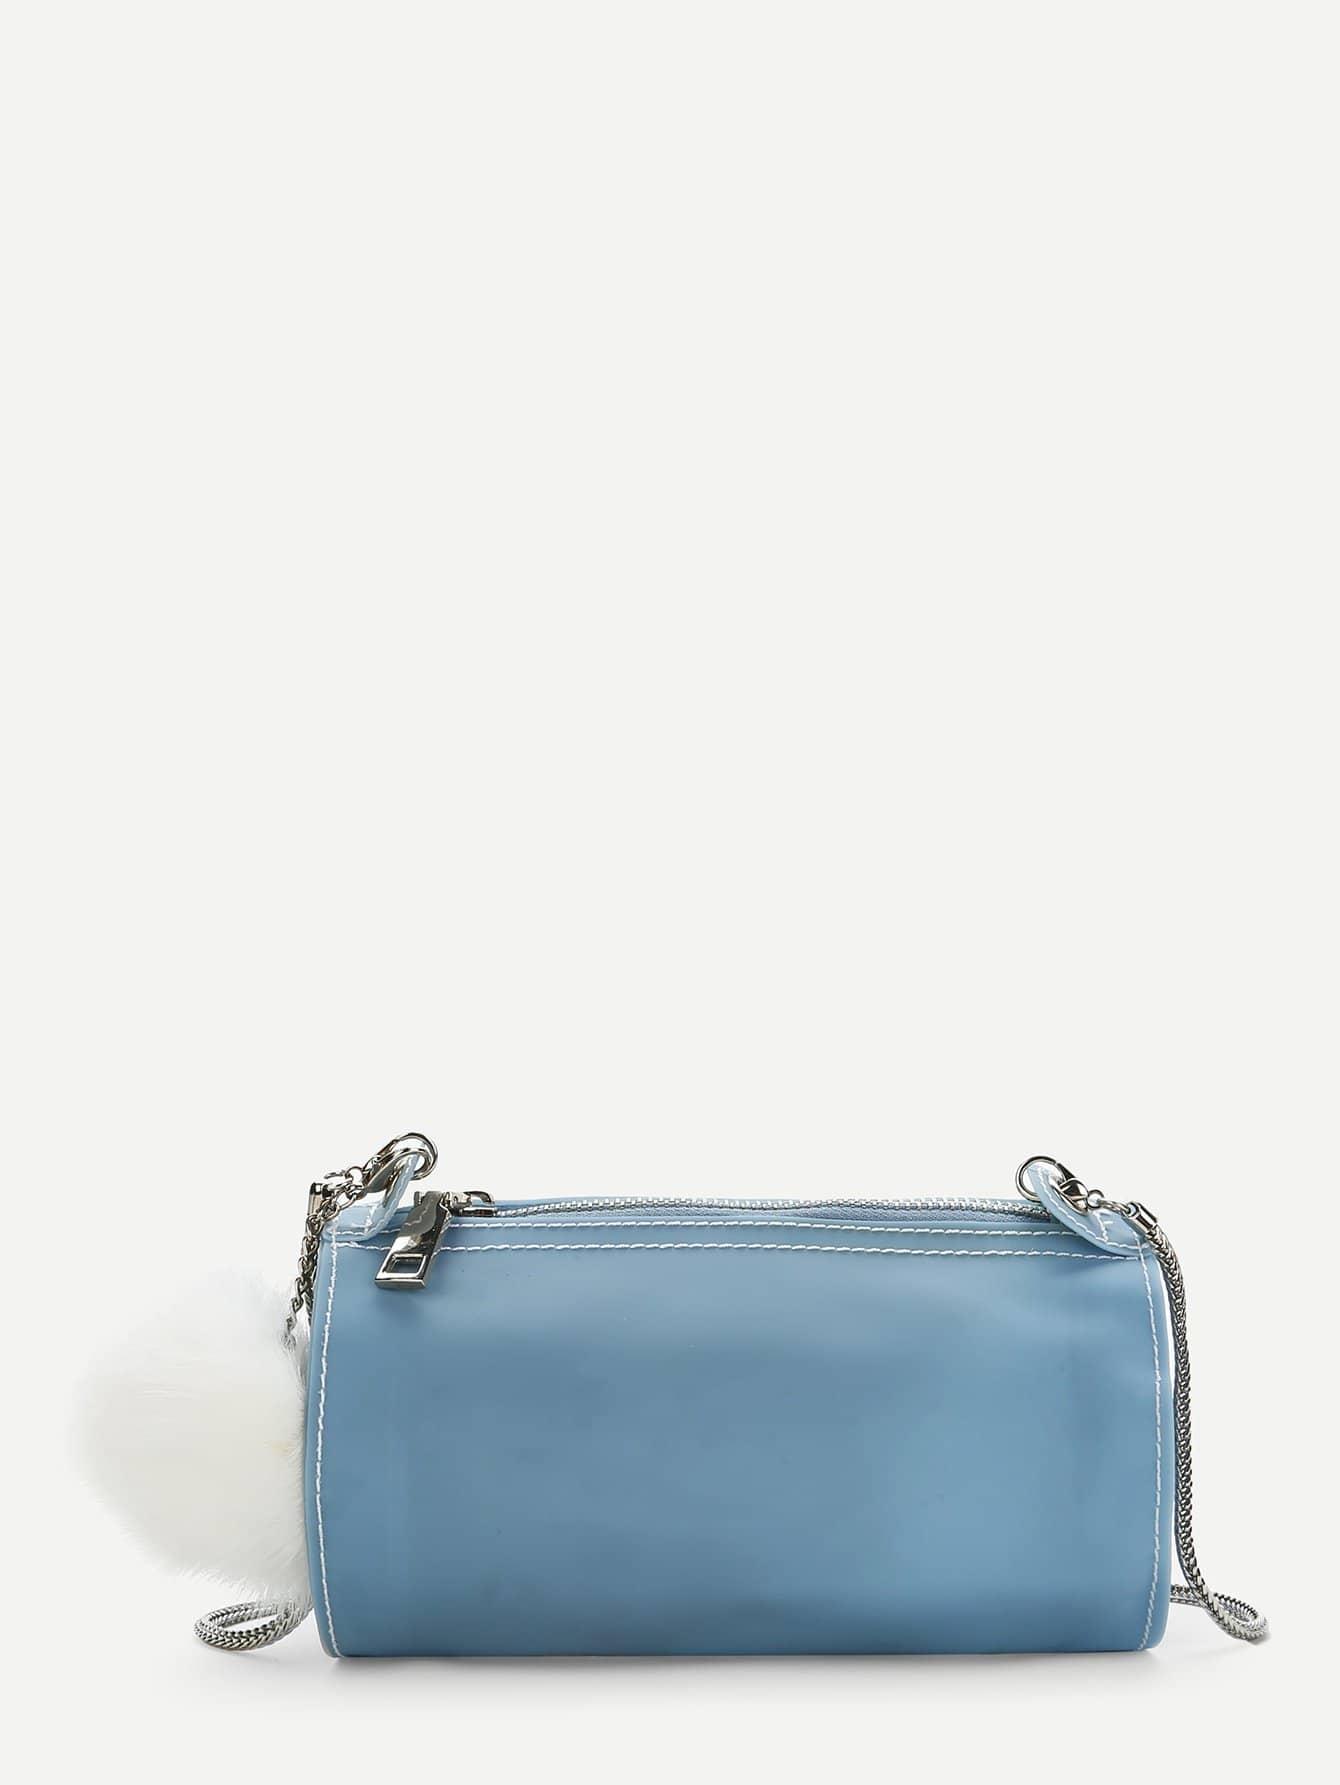 Chain Crossbody Bag With Pom Pom cameo brown pu pom pom trim convertible handbag with chain bag